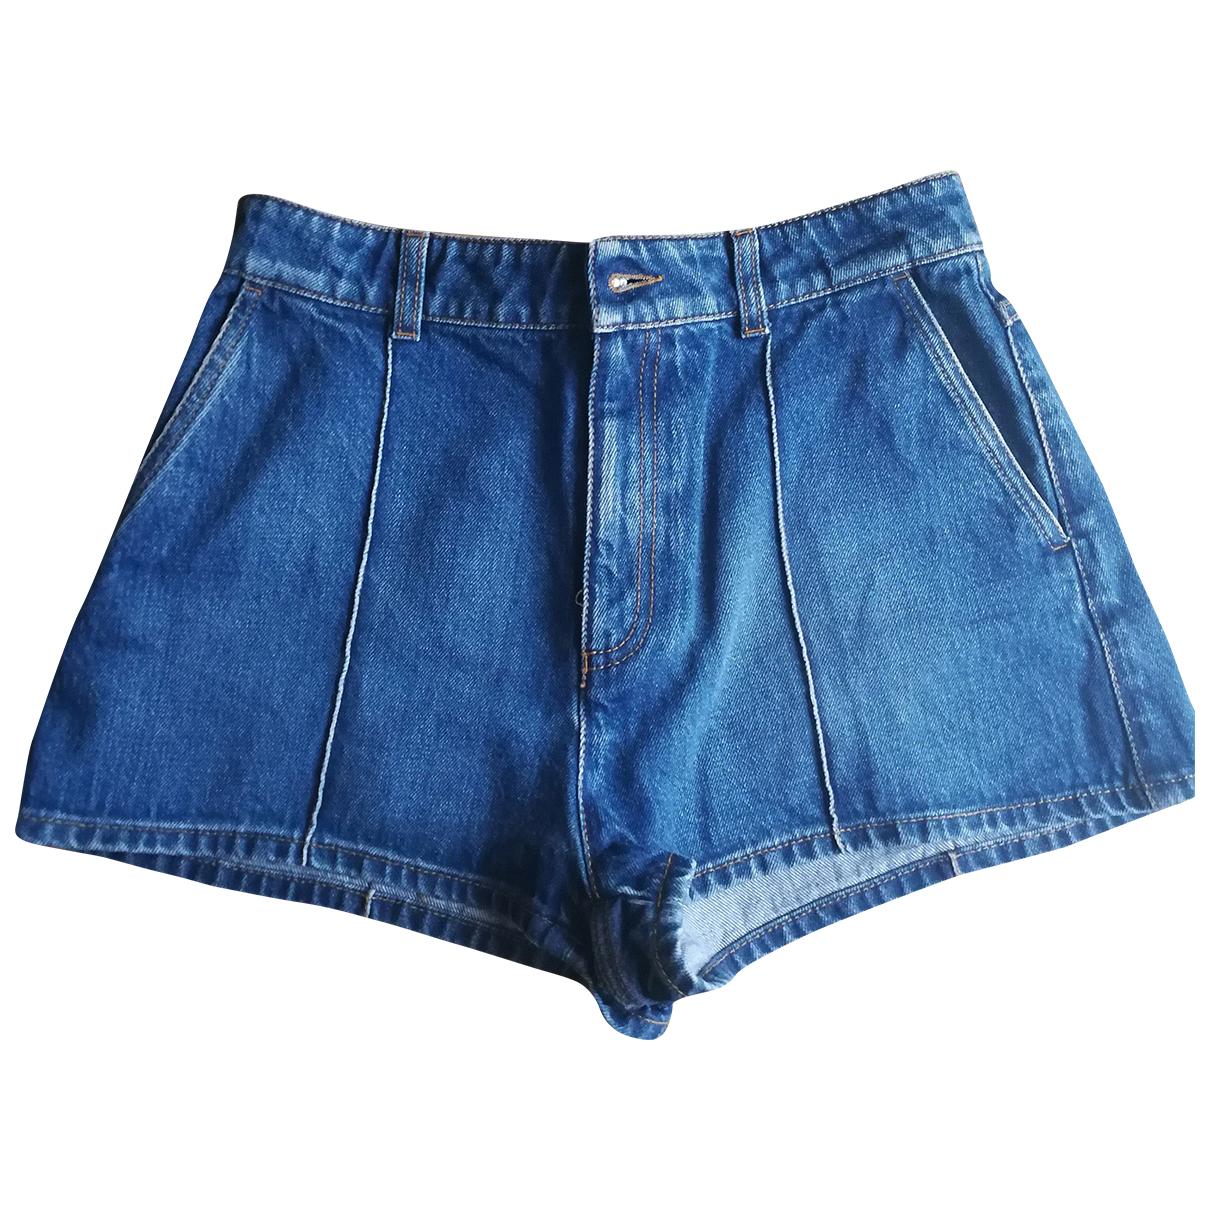 Alexander Mcqueen \N Blue Denim - Jeans Shorts for Women 38 FR